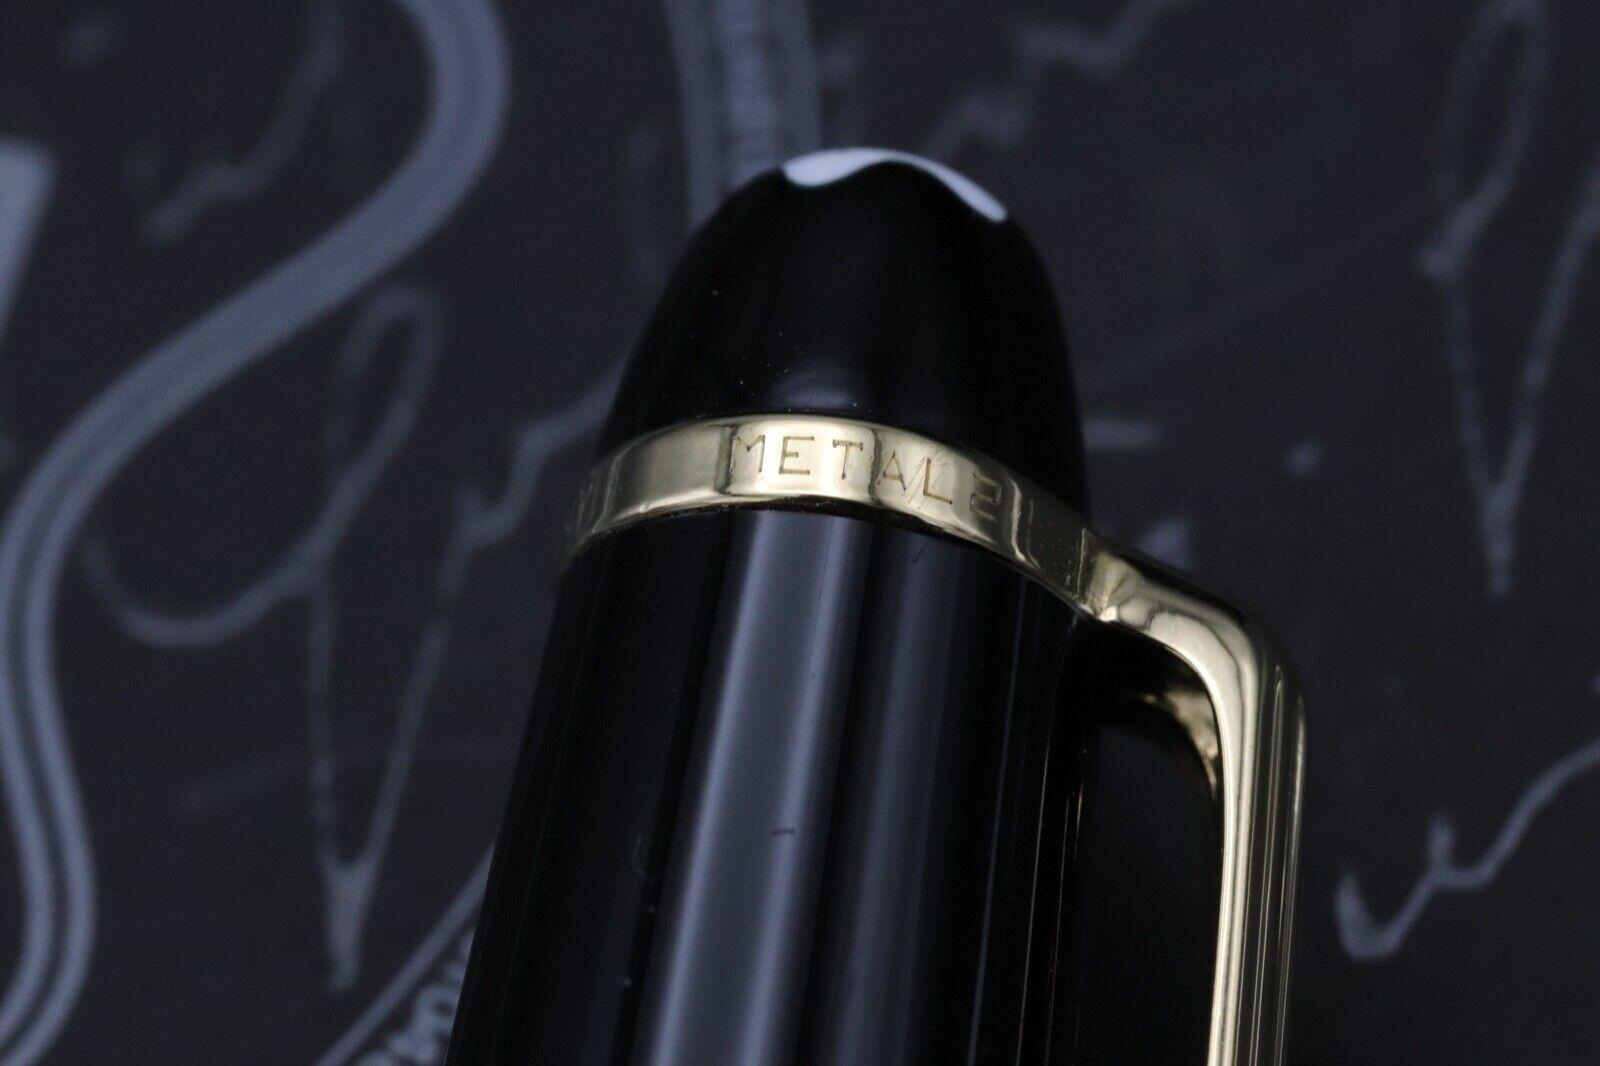 Montblanc Meisterstuck 144 Classique 'Wedding Pen' Fountain Pen 6